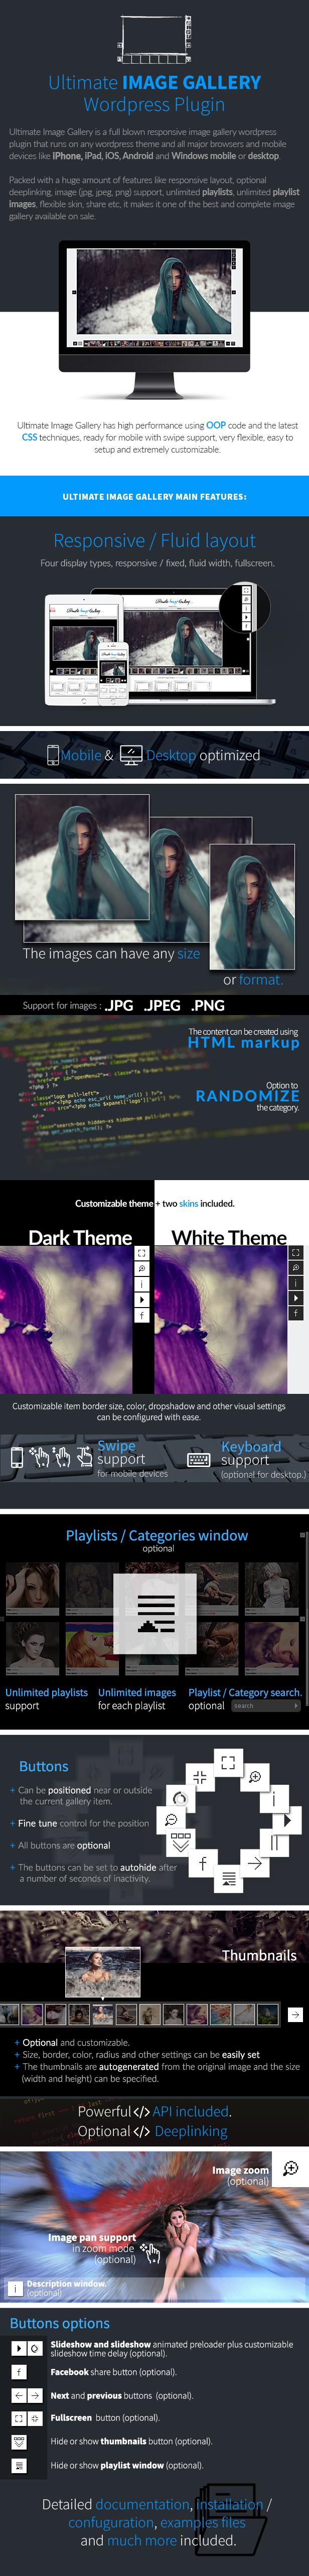 Ultimate Image Gallery WordPress Plugin - 6